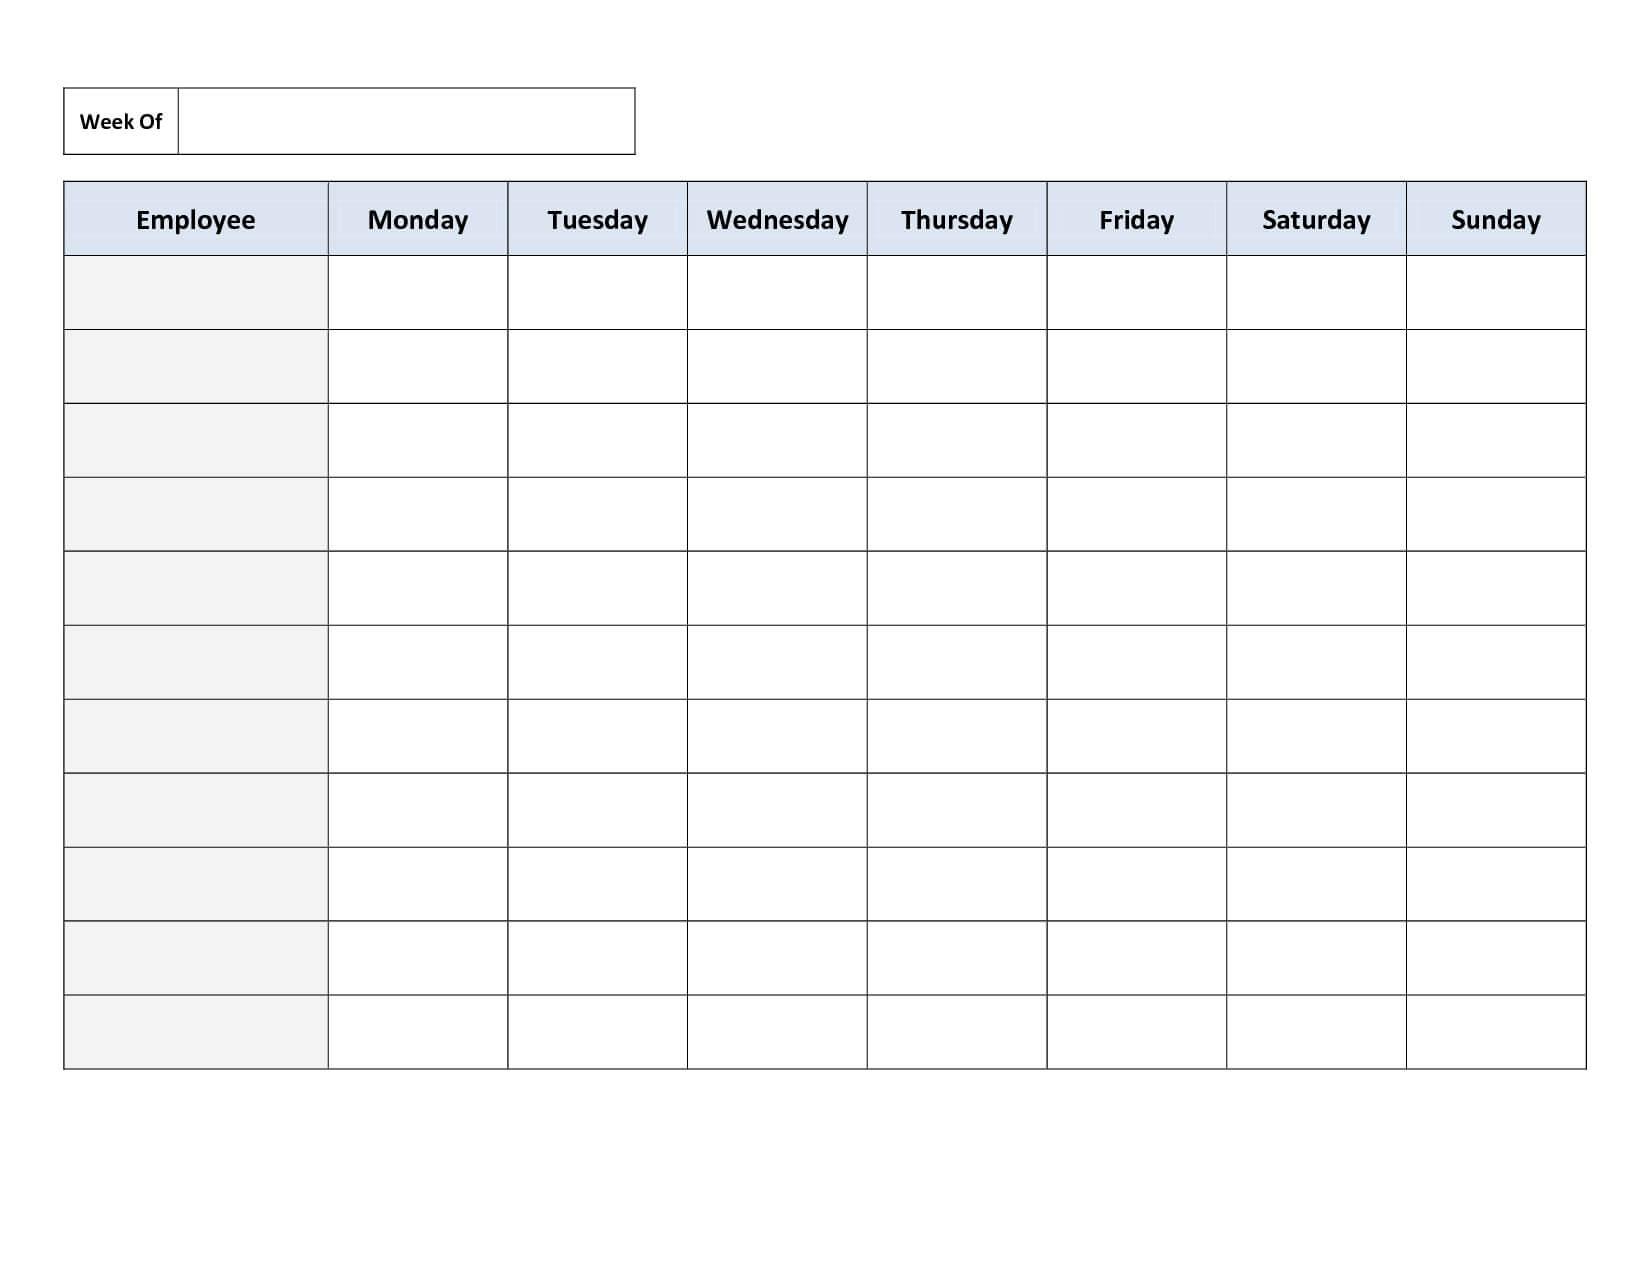 Blank Weekly Work Schedule Template | Schedule | Class With Regard To Blank Monthly Work Schedule Template